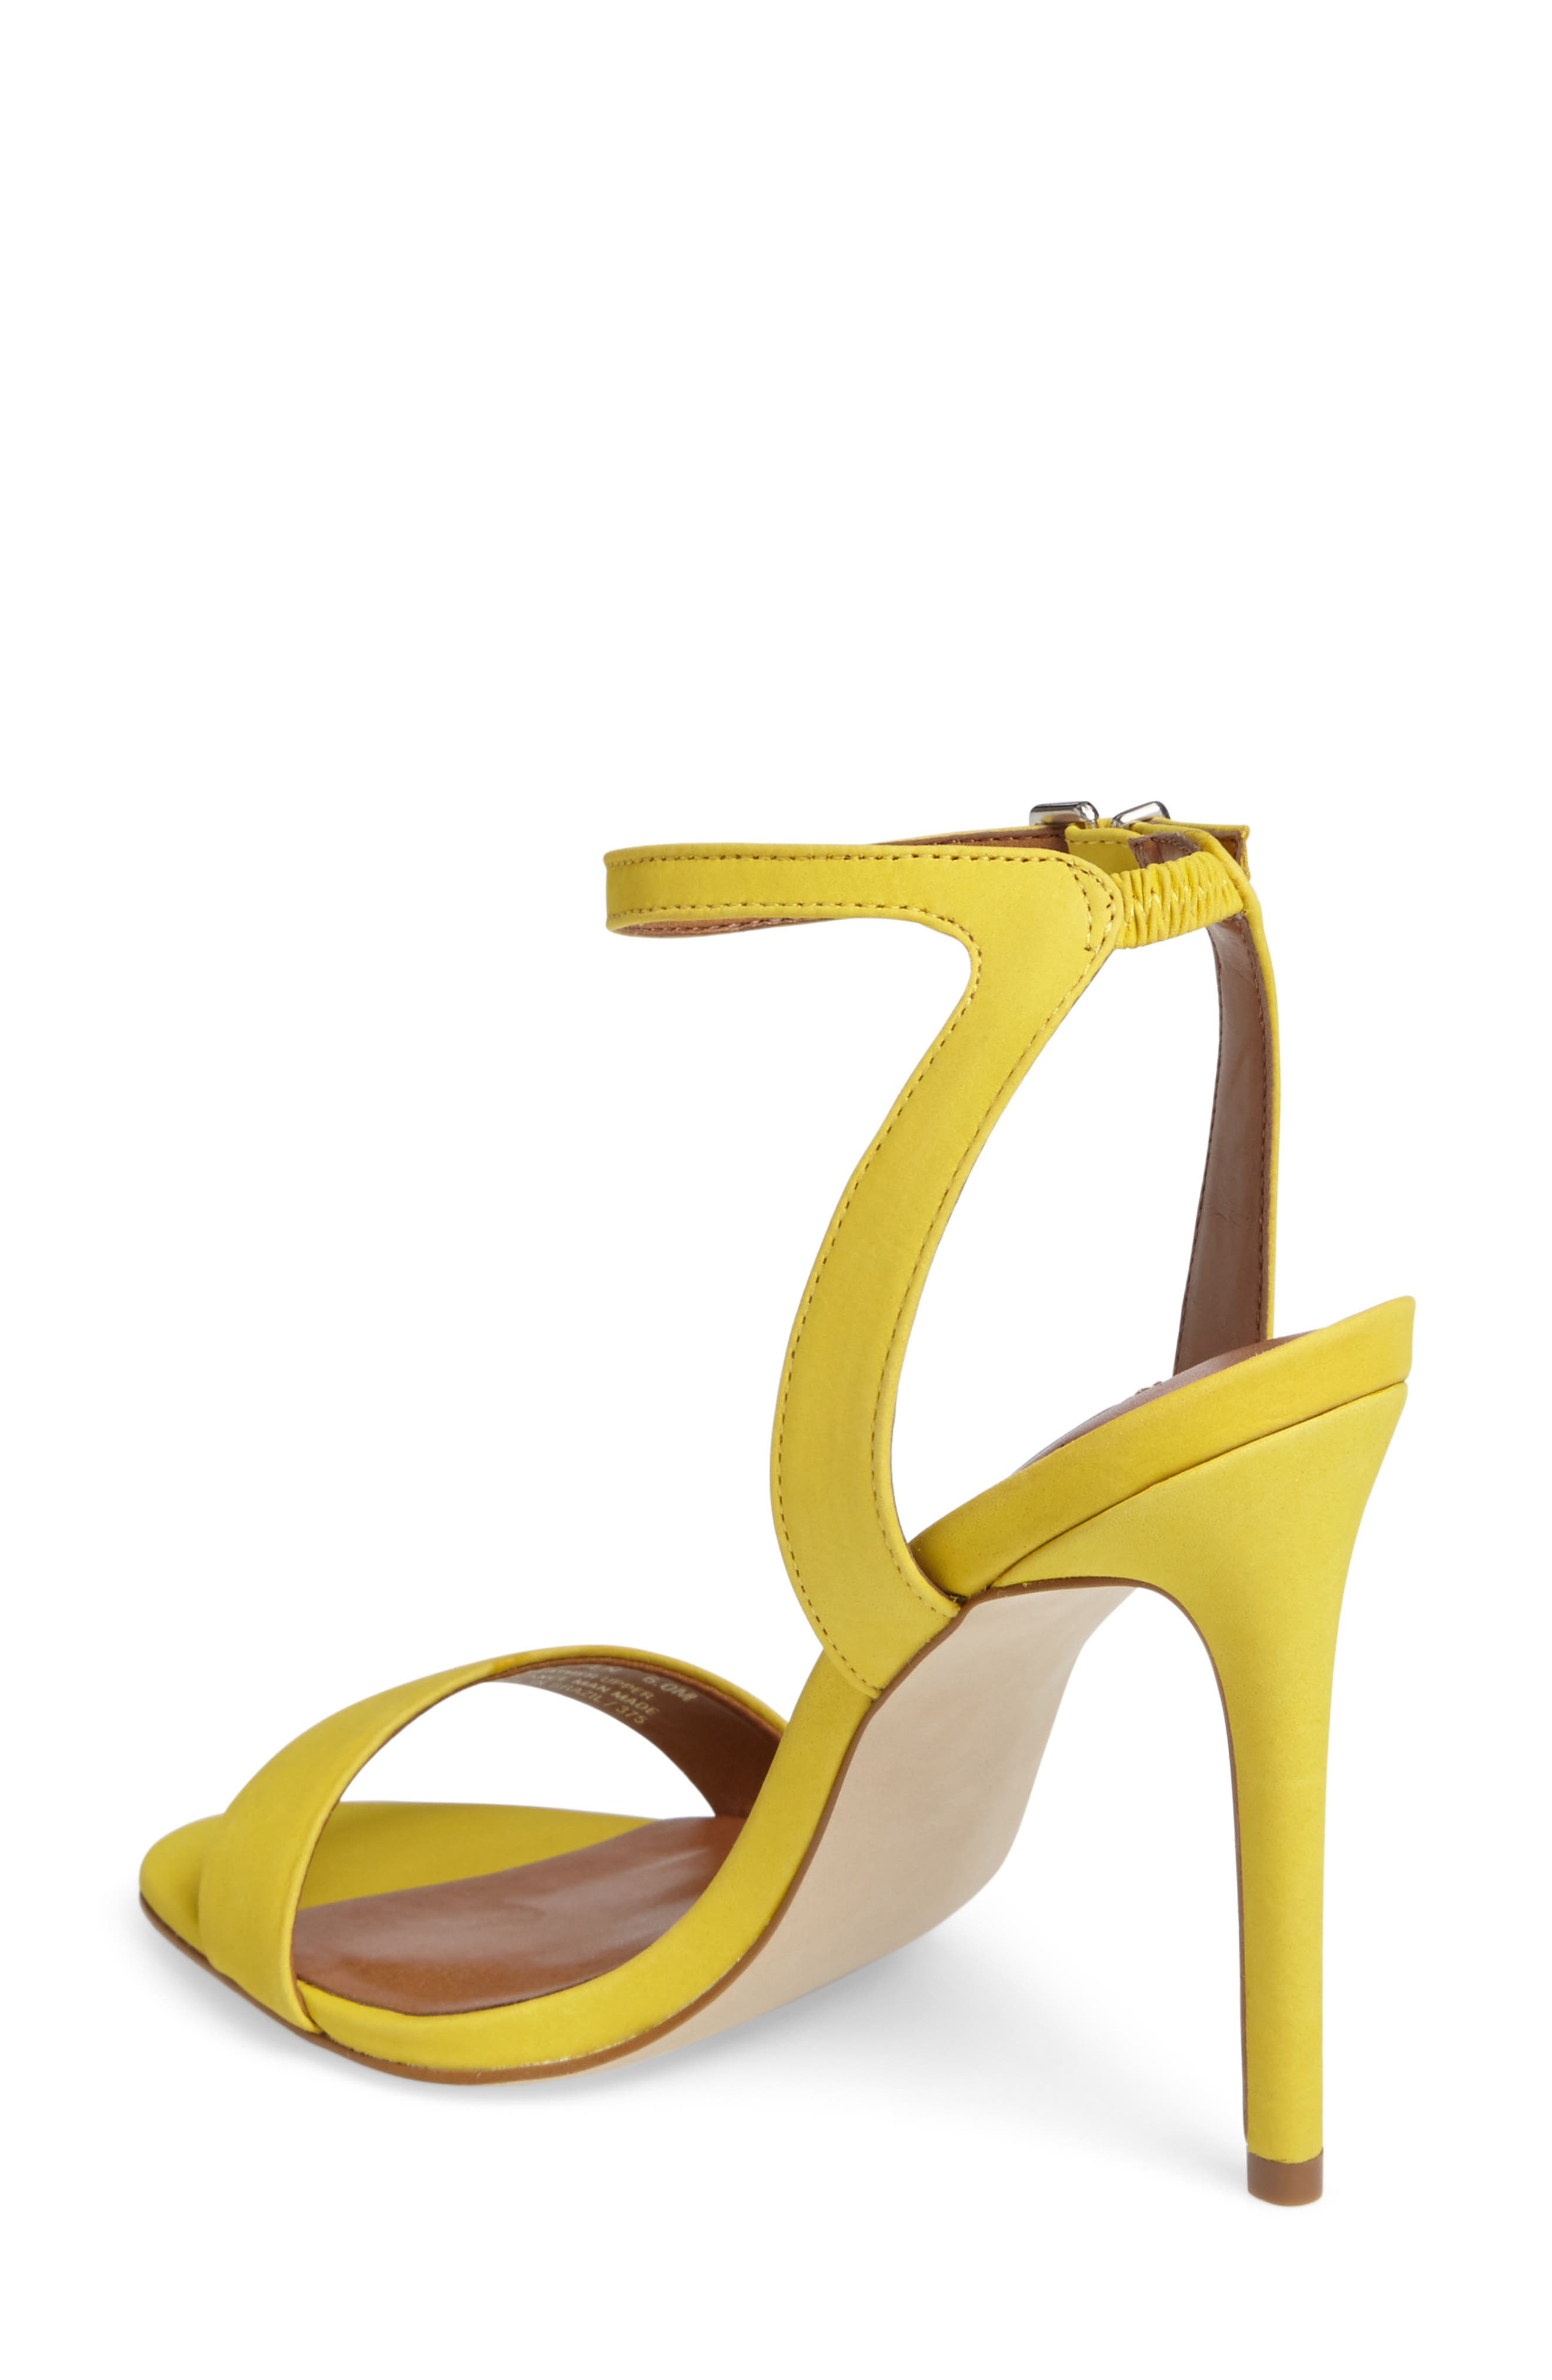 Landen Ankle Strap Sandal,                             Alternate thumbnail 33, color,